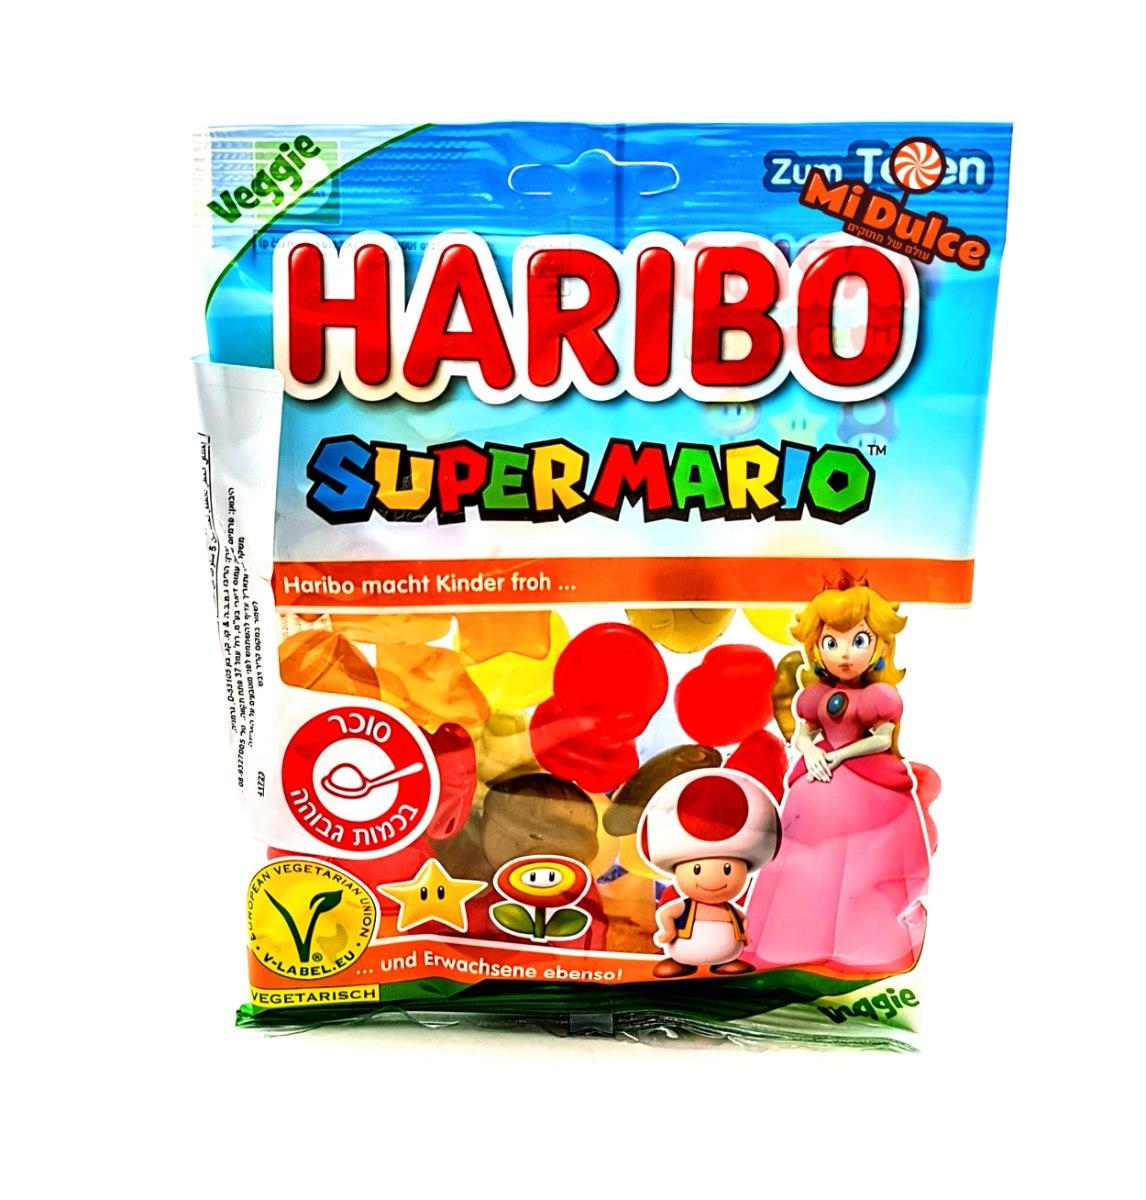 Haribo Super Mario